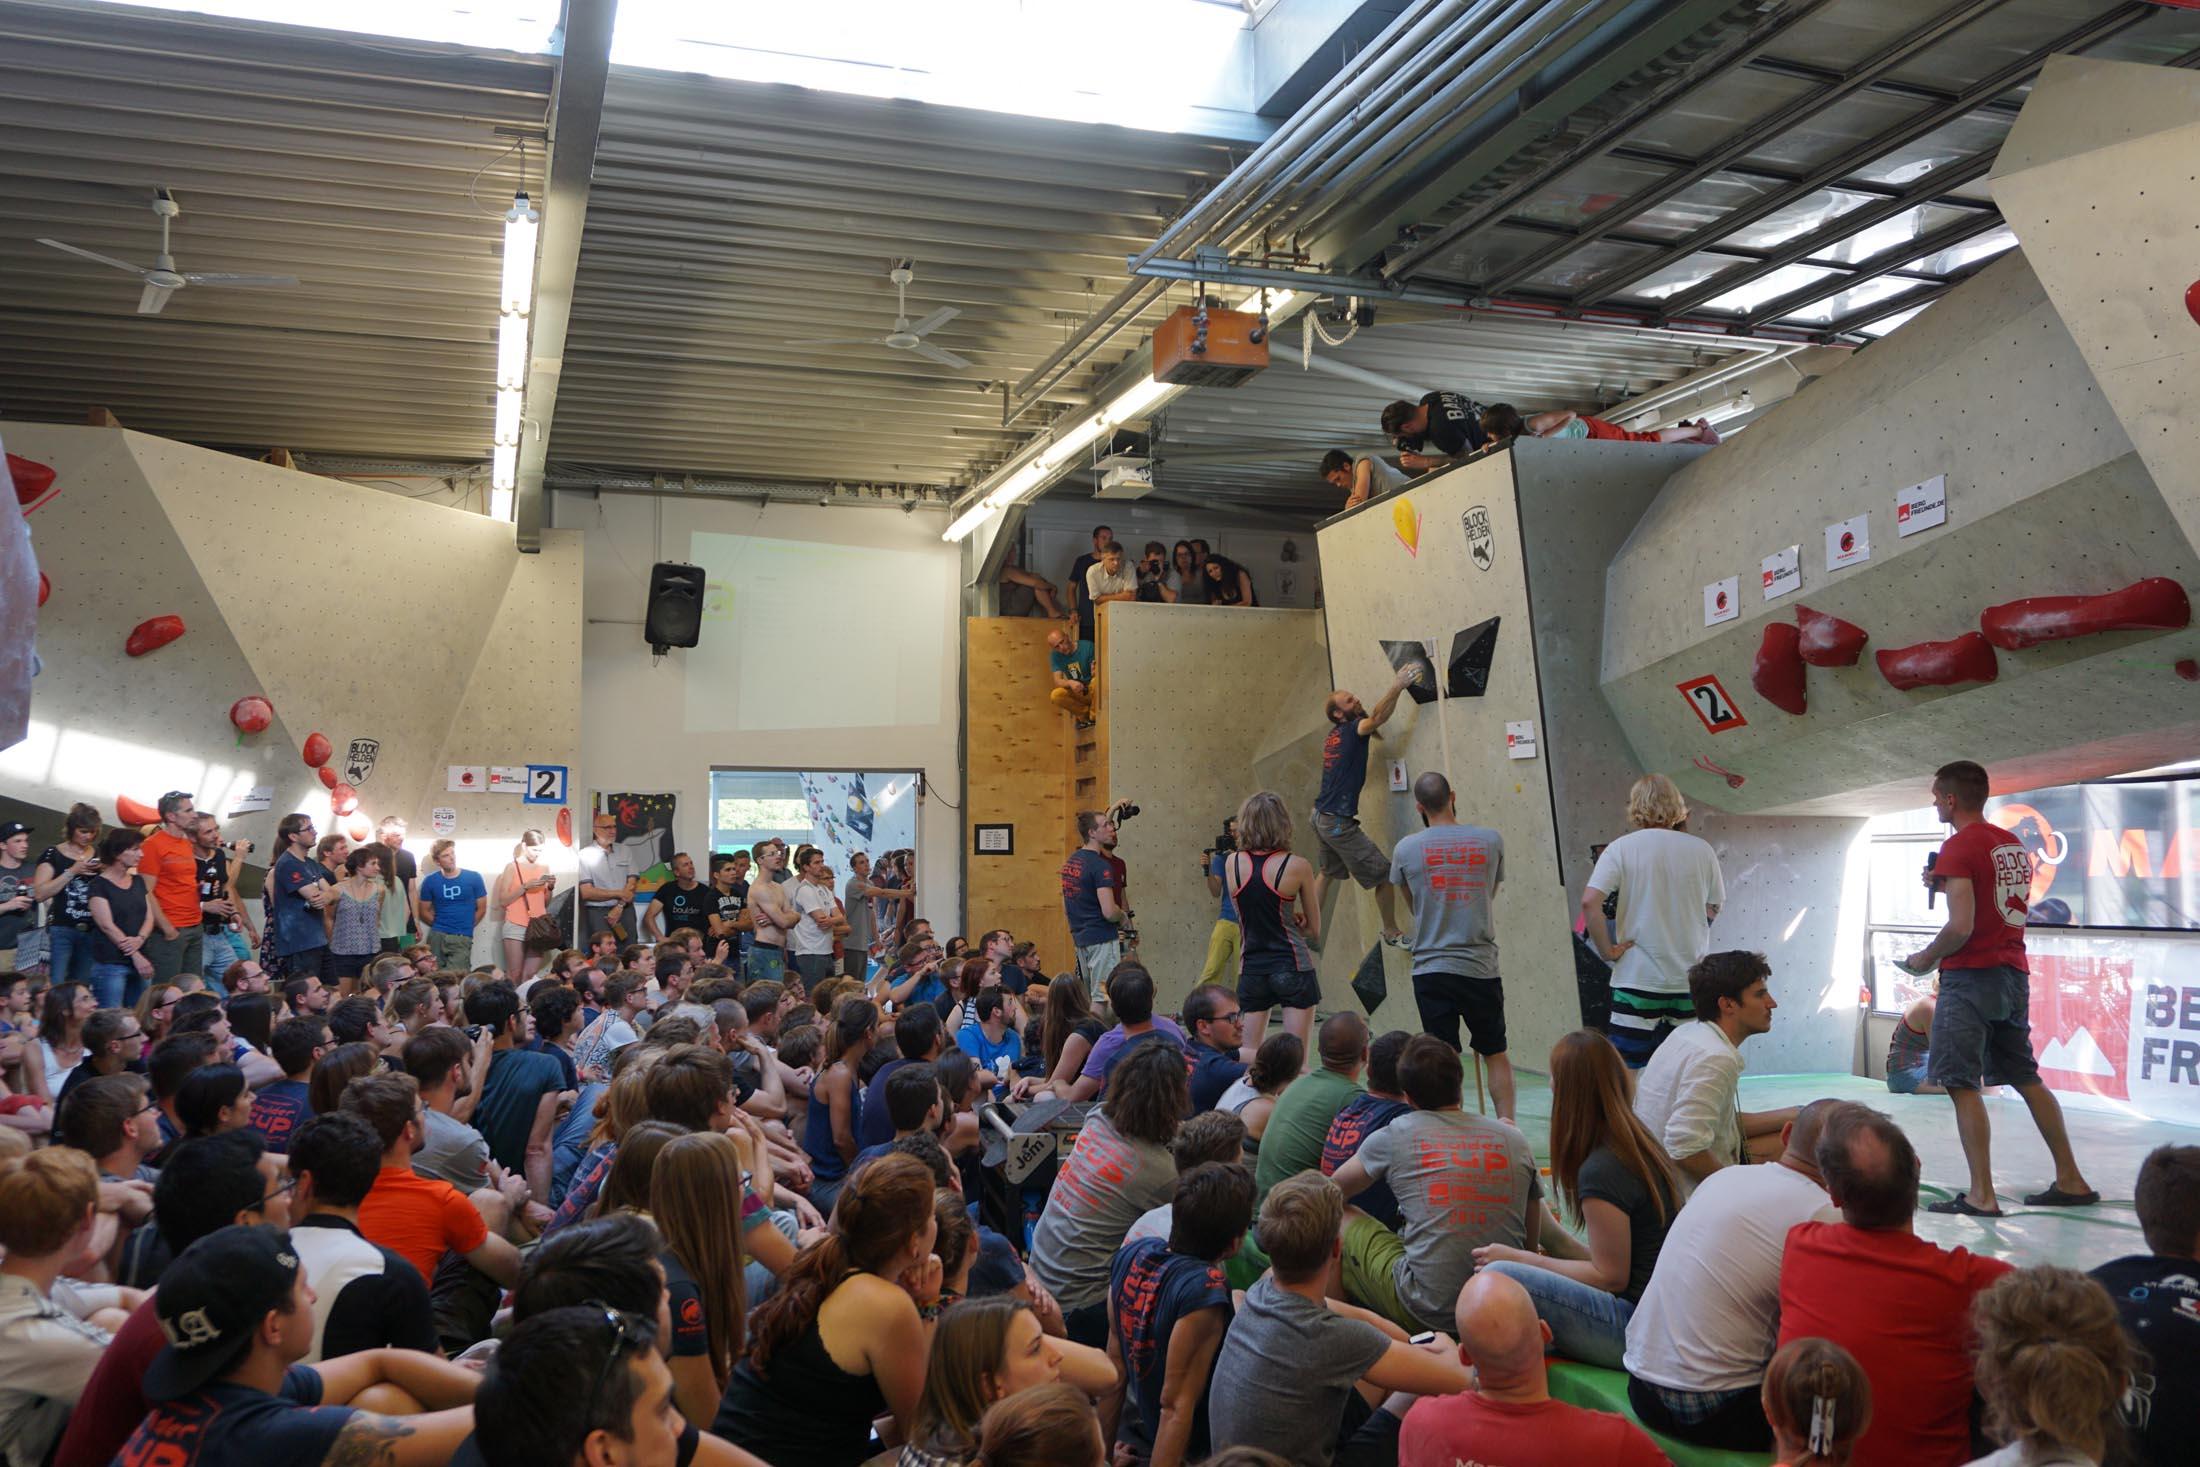 Finale, internationaler bouldercup Frankenjura 2016, BLOCKHELDEN Erlangen, Mammut, Bergfreunde.de, Boulderwettkampf07092016538